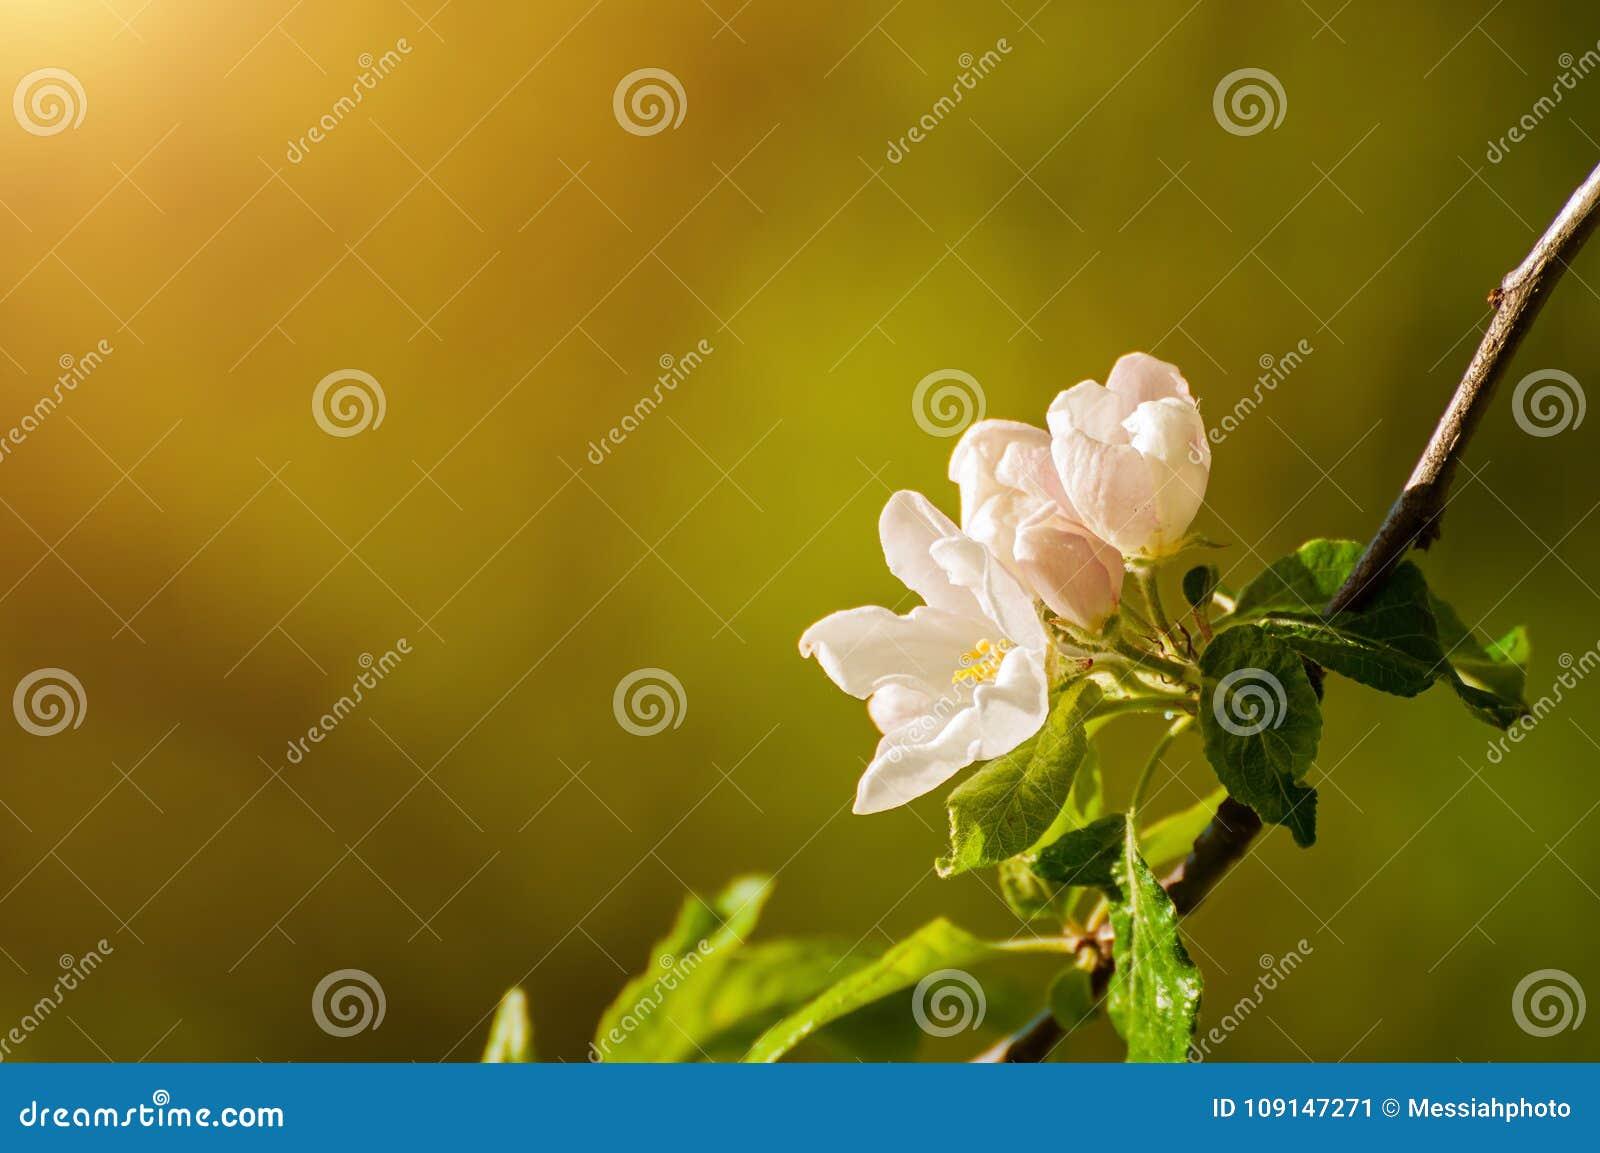 Spring Apple Flowers In Bloom Lit By Soft Sunlight Spring Flower